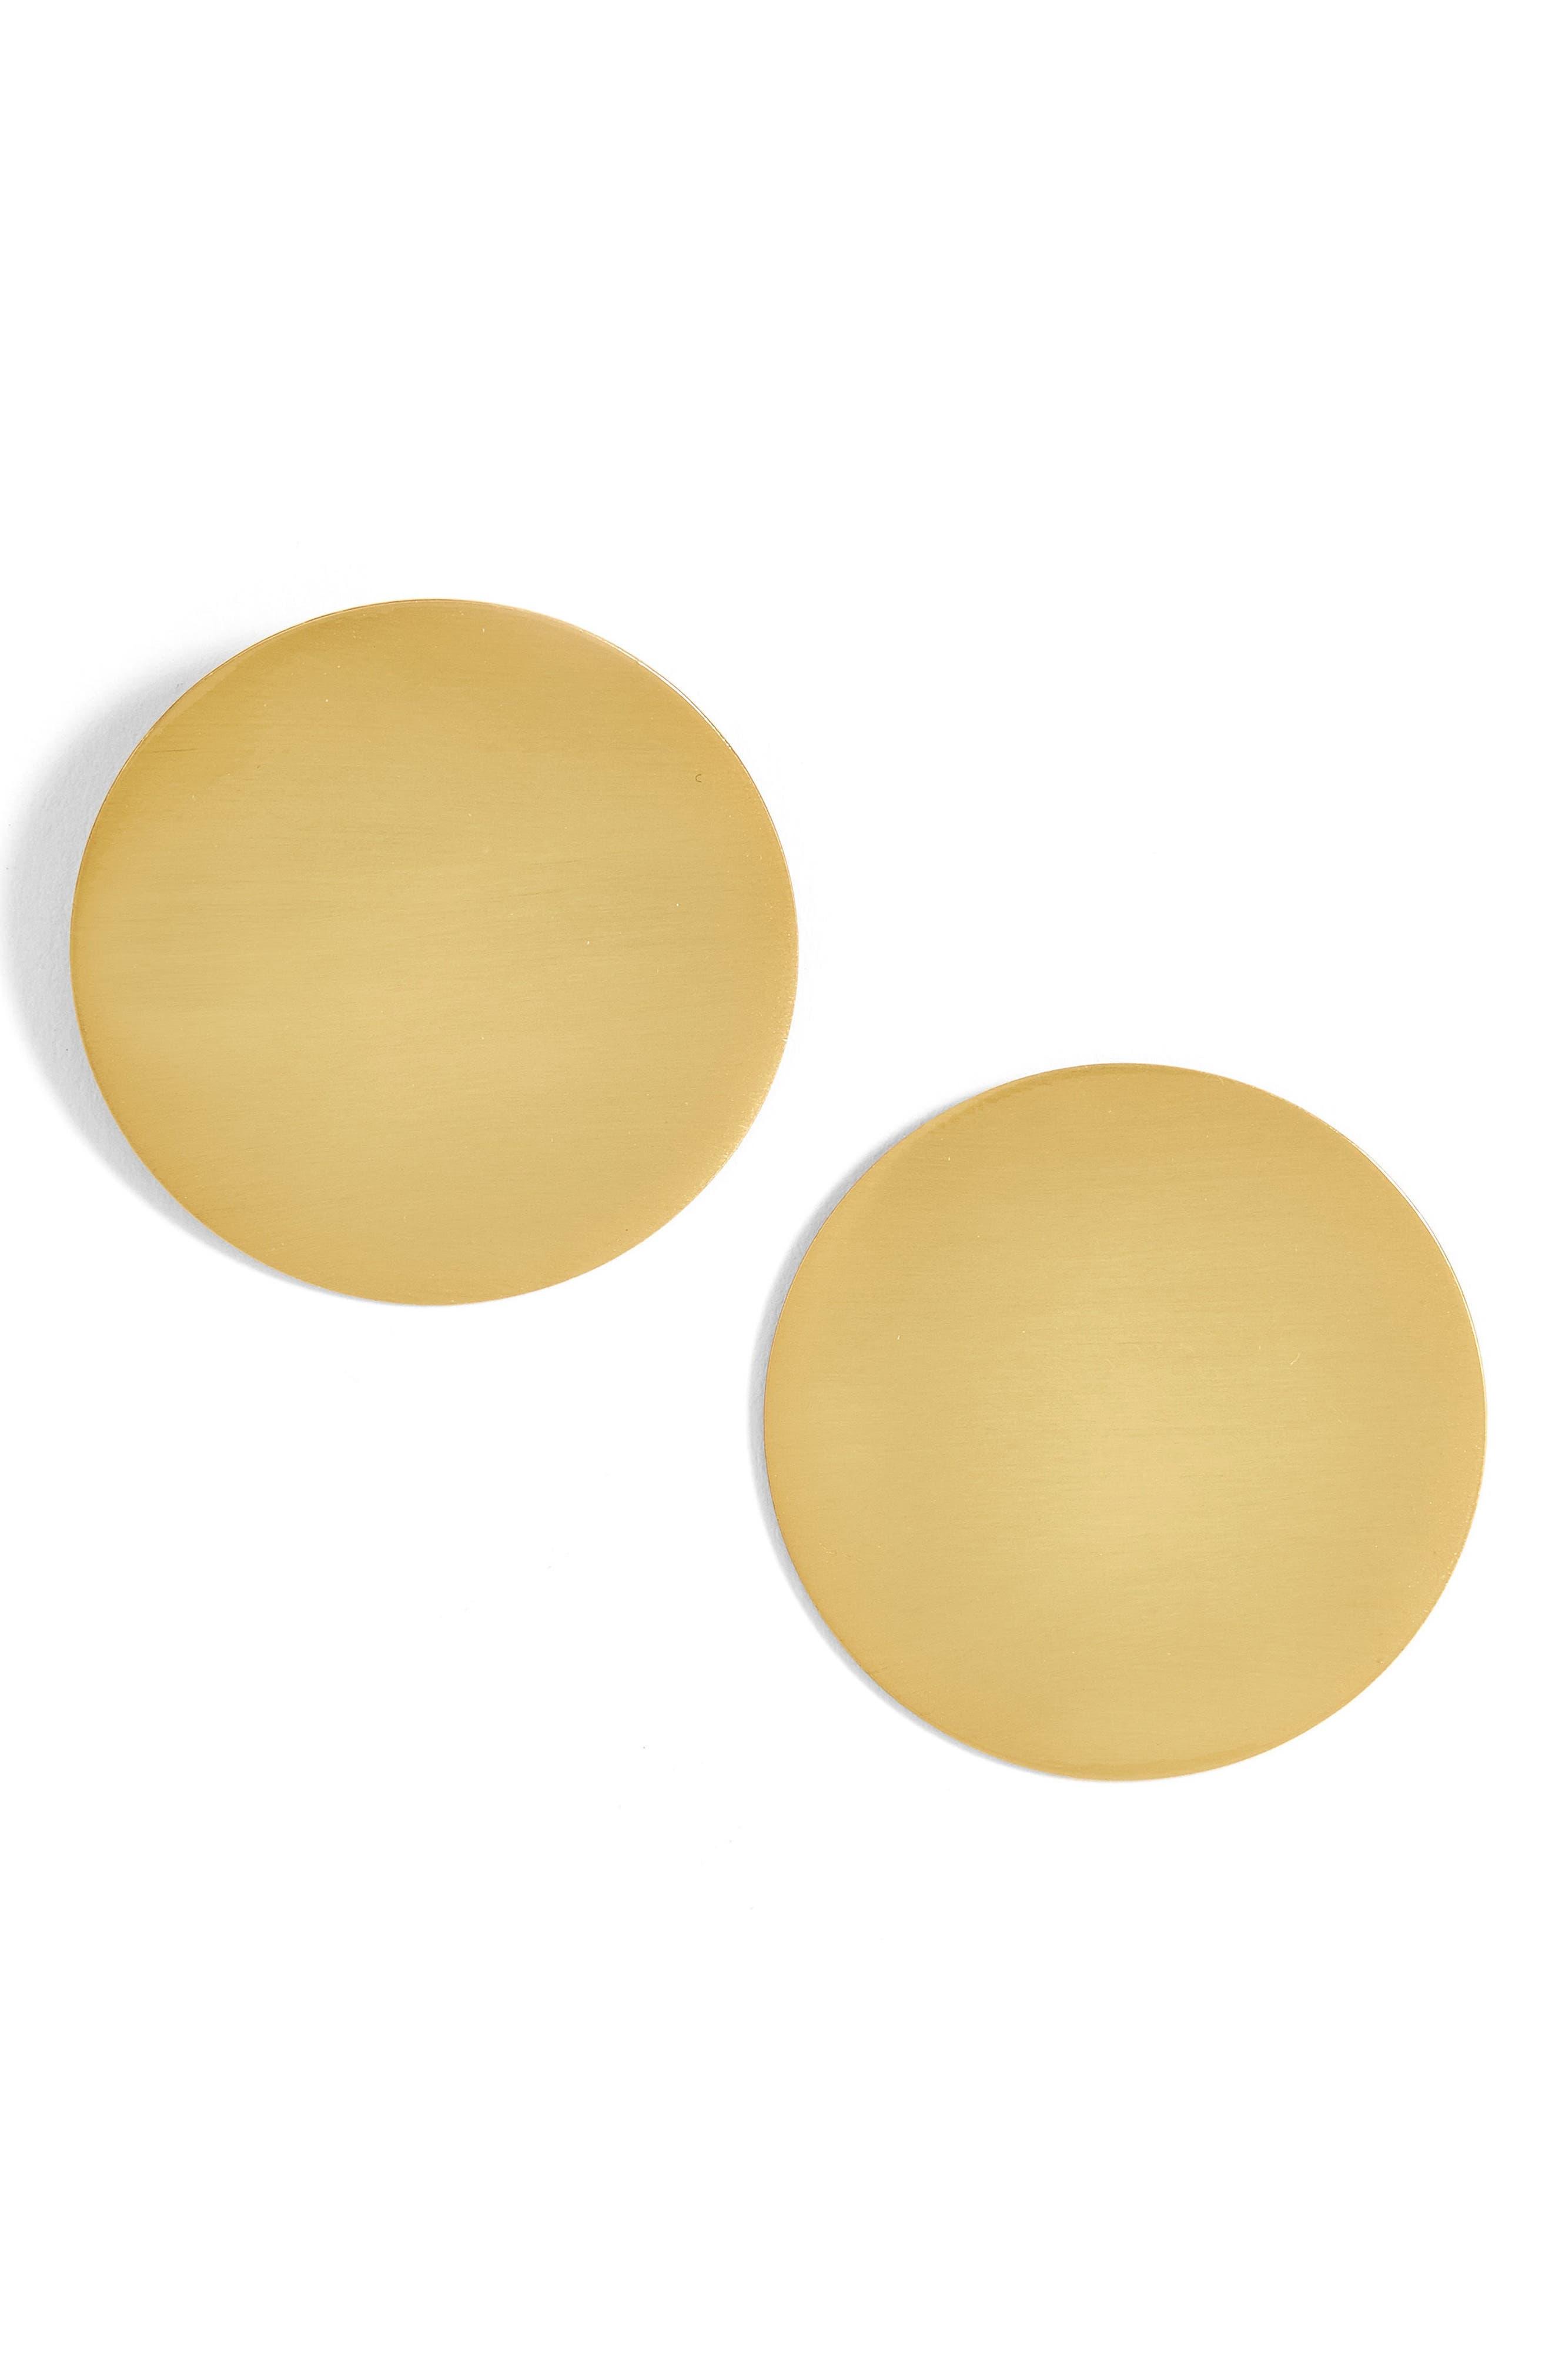 Main Image - BaubleBar Cora Disk Stud Earrings